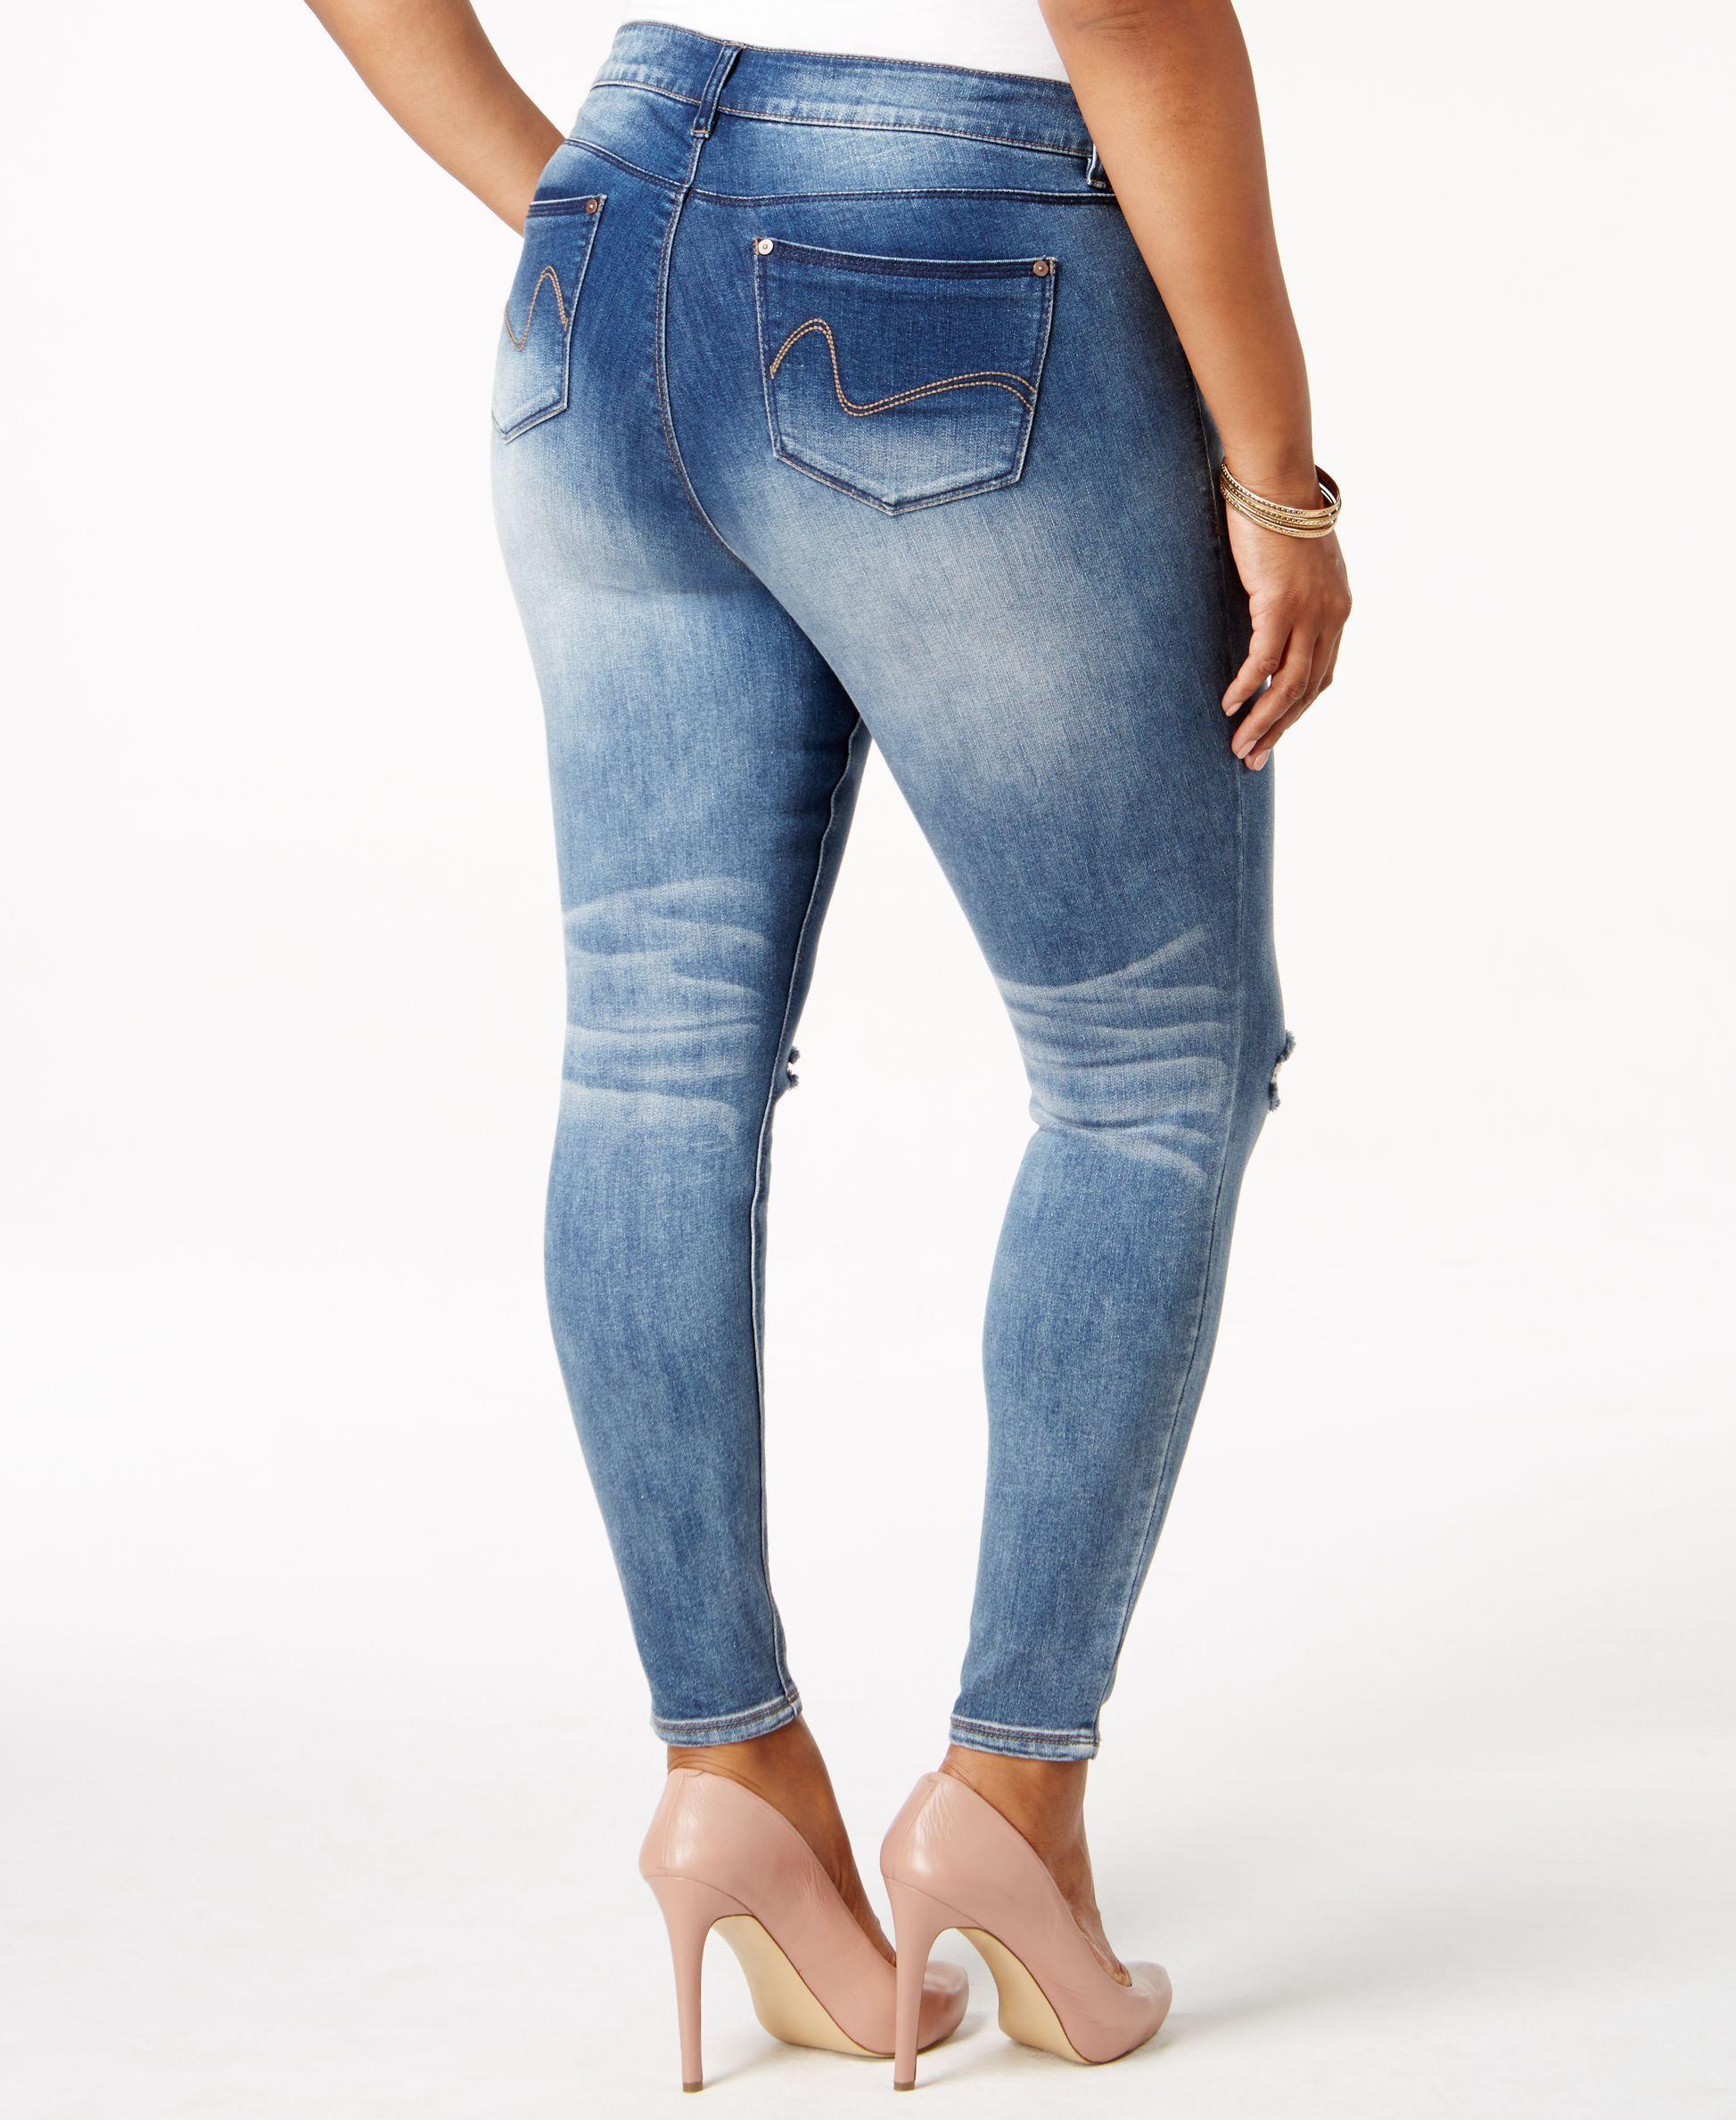 6a1006c64e8 Rocks   Indigo Plus Size Ripped Faded Skinny Jeans